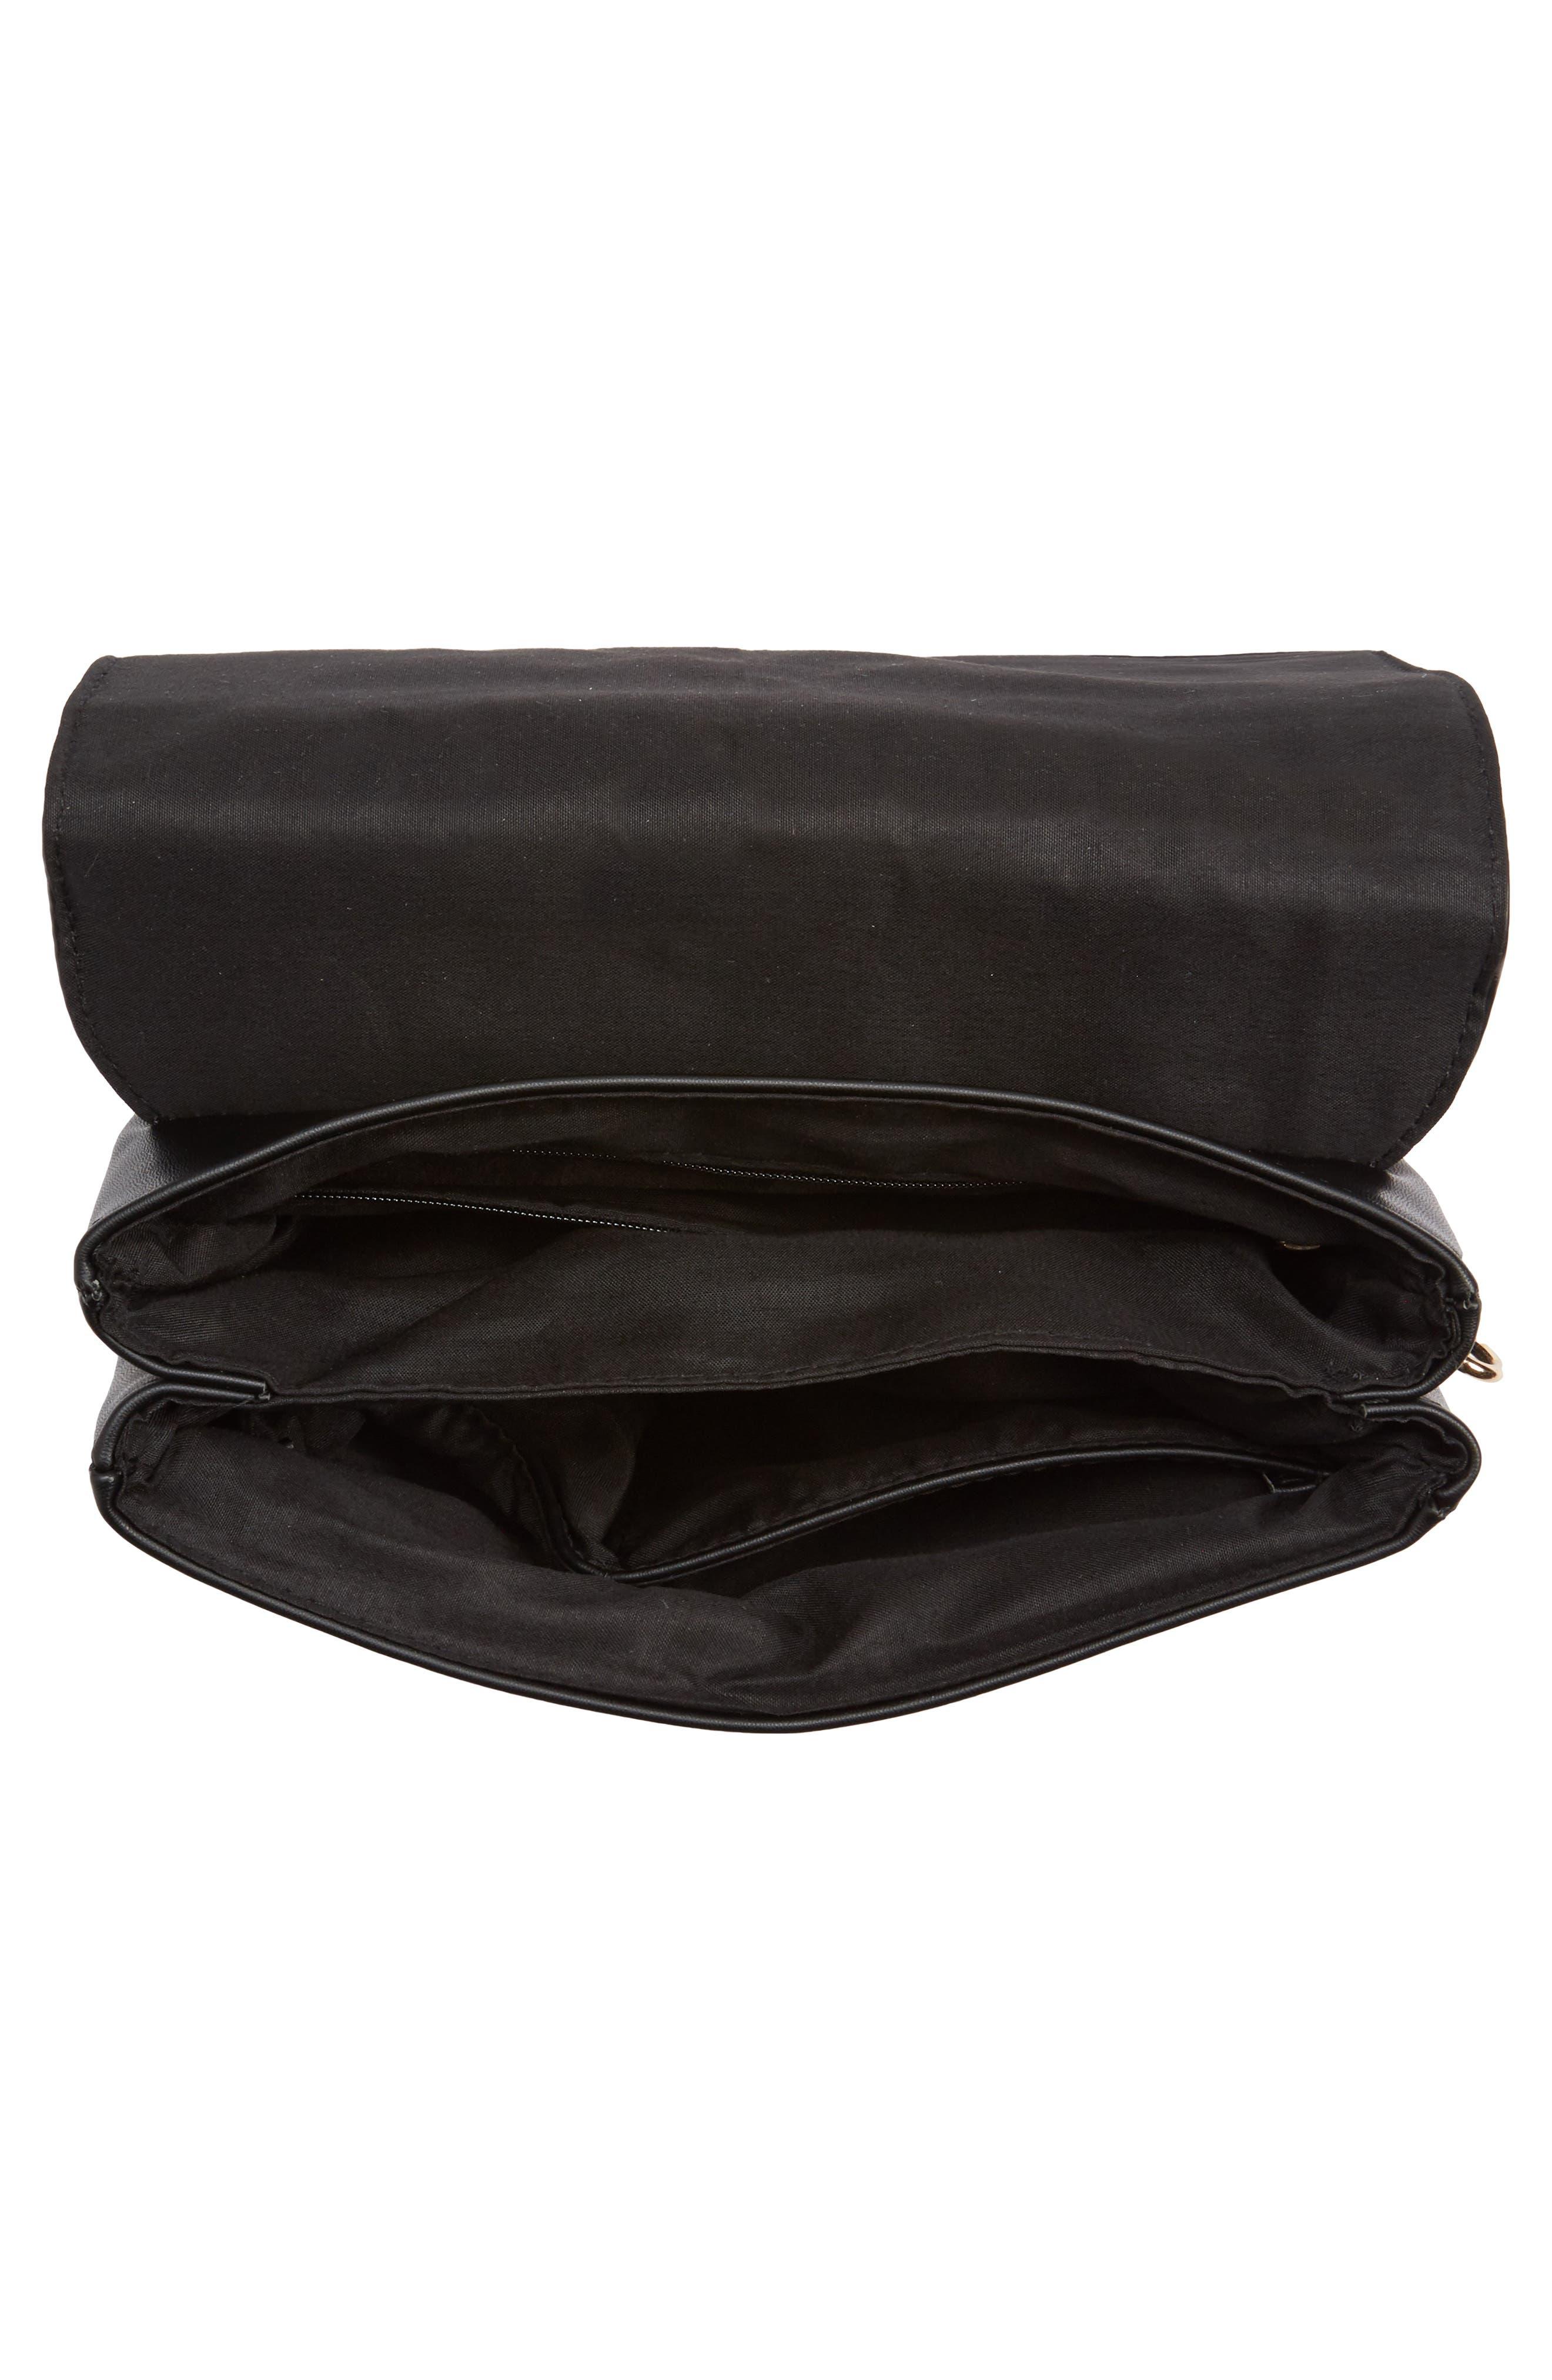 Studded Faux Leather Crossbody Bag,                             Alternate thumbnail 4, color,                             Black